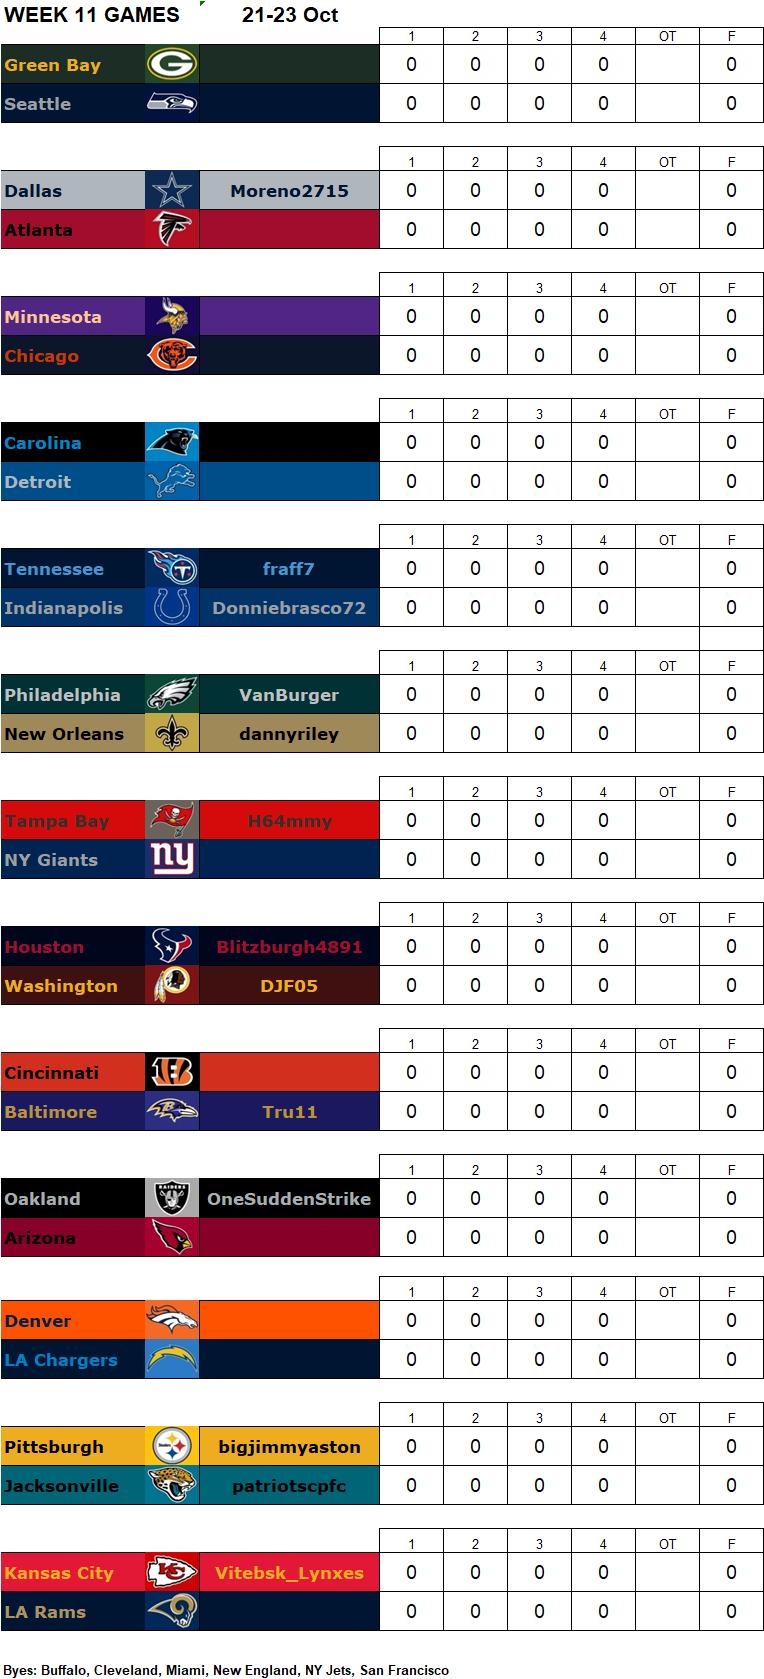 Week 11 Matchups, 21-23 October W11g11